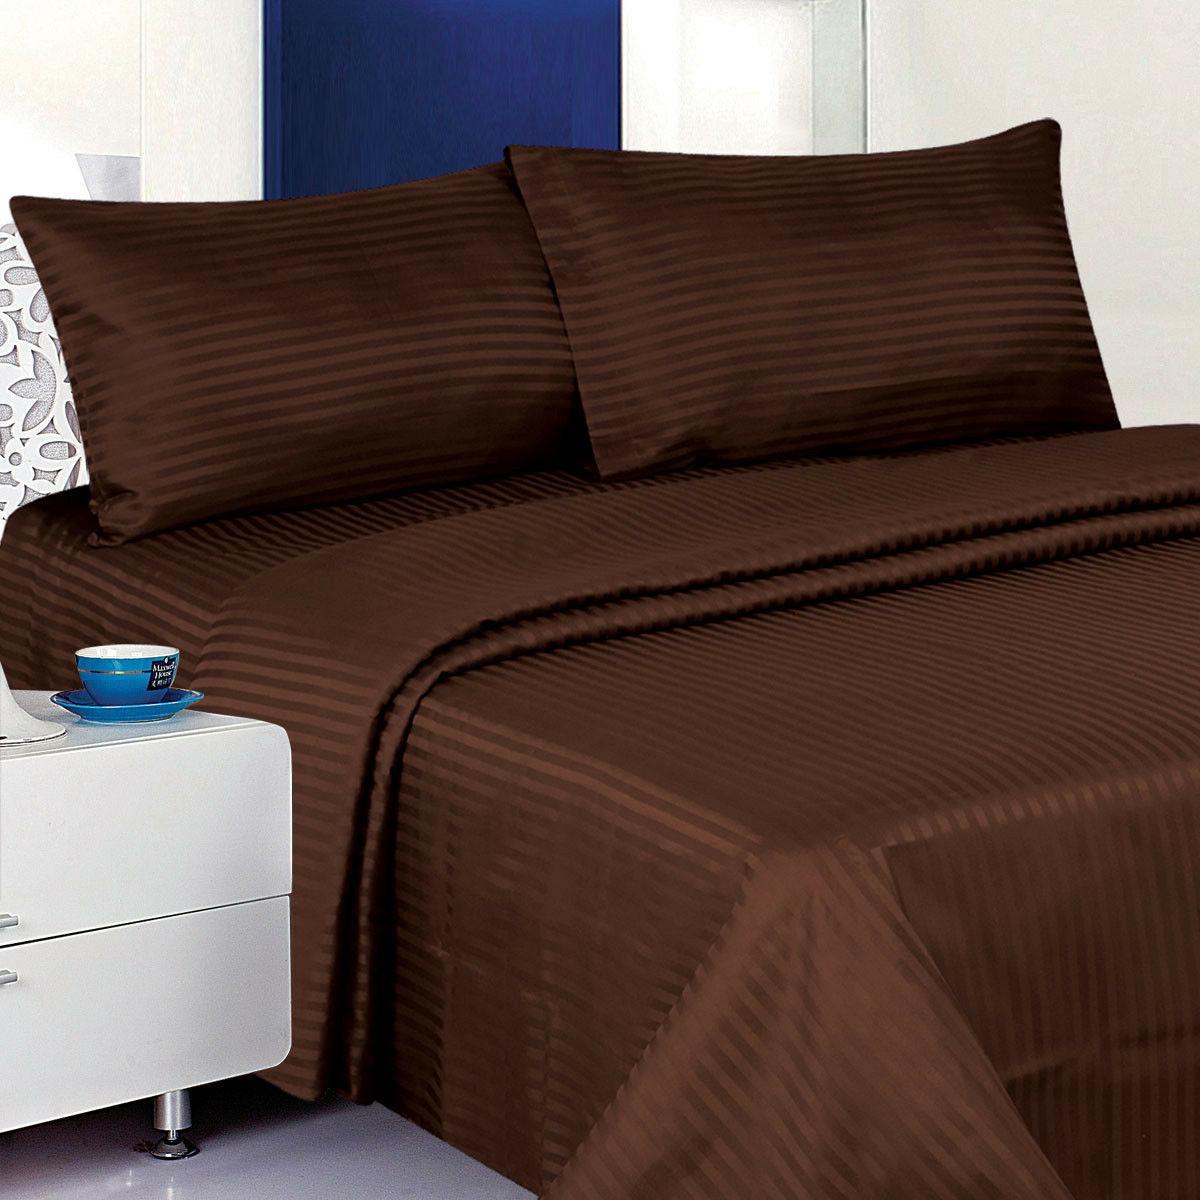 1800 Deluxe 4-Piece Dobby Stripe Cotton Deep Pocket Bed Set